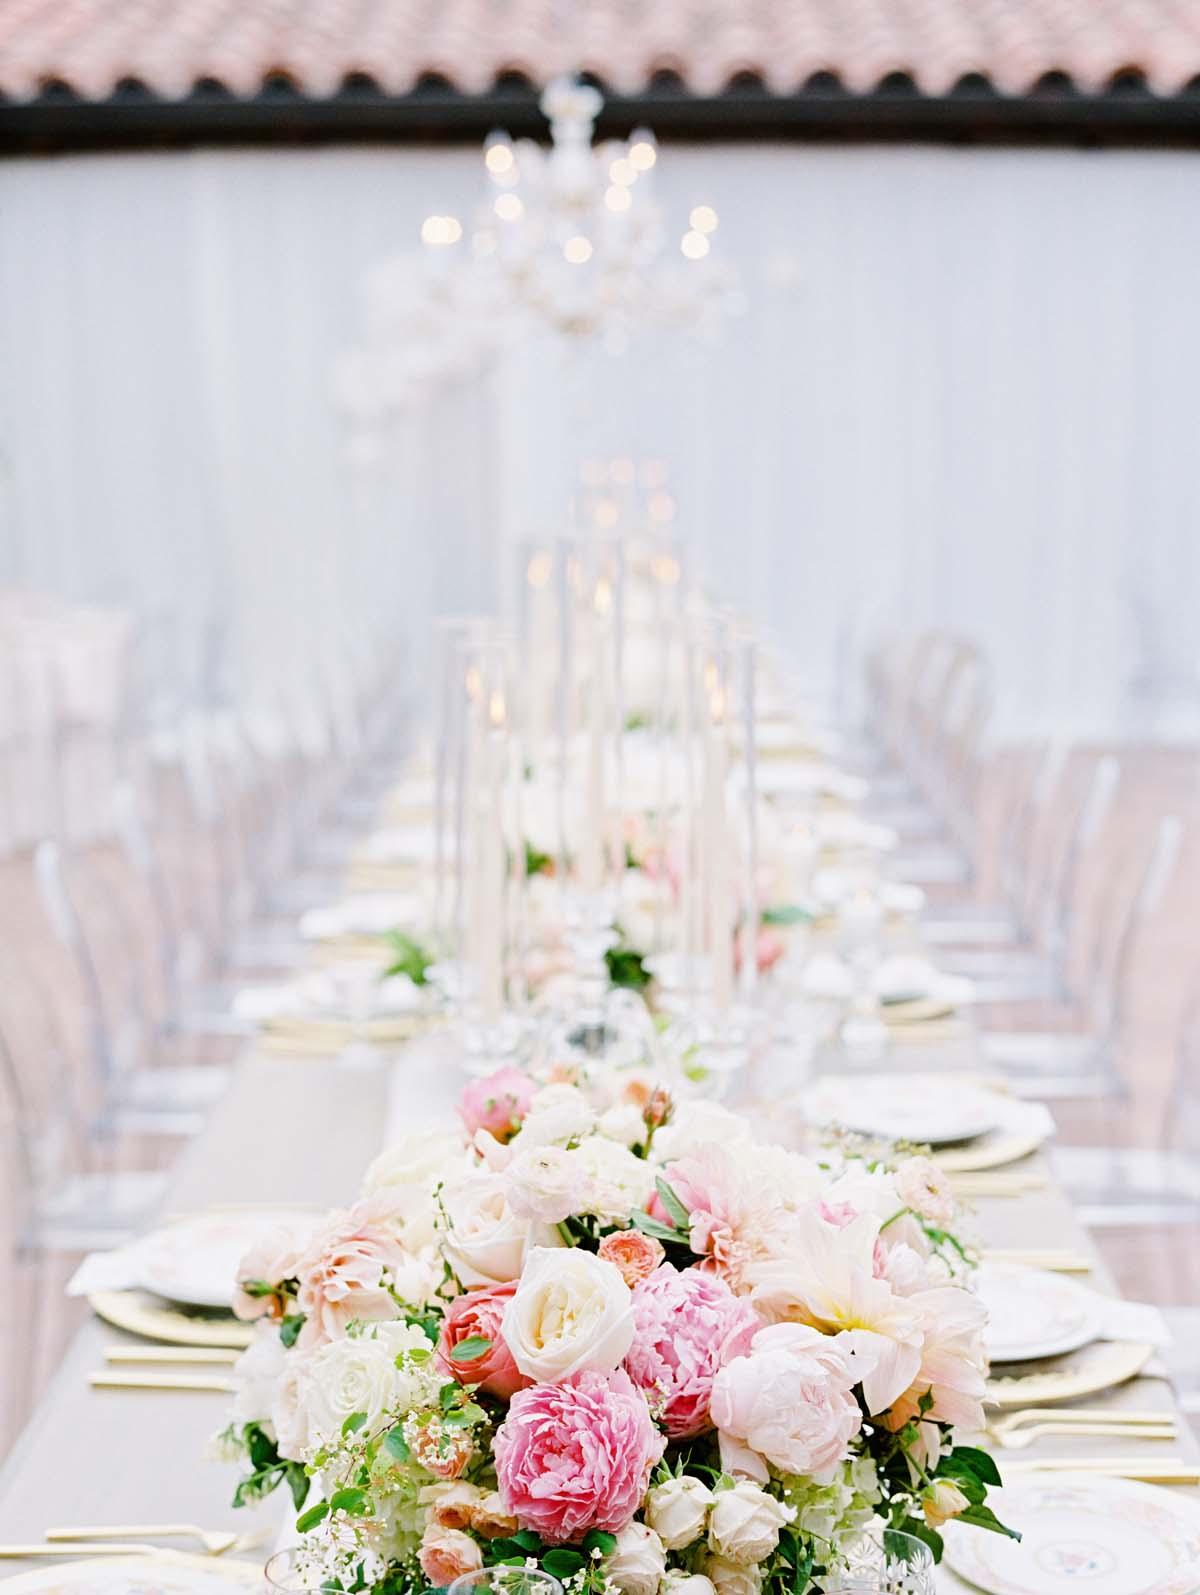 XOXO-BRIDE-Events_Michael-Anna-Costa-Photography-0035